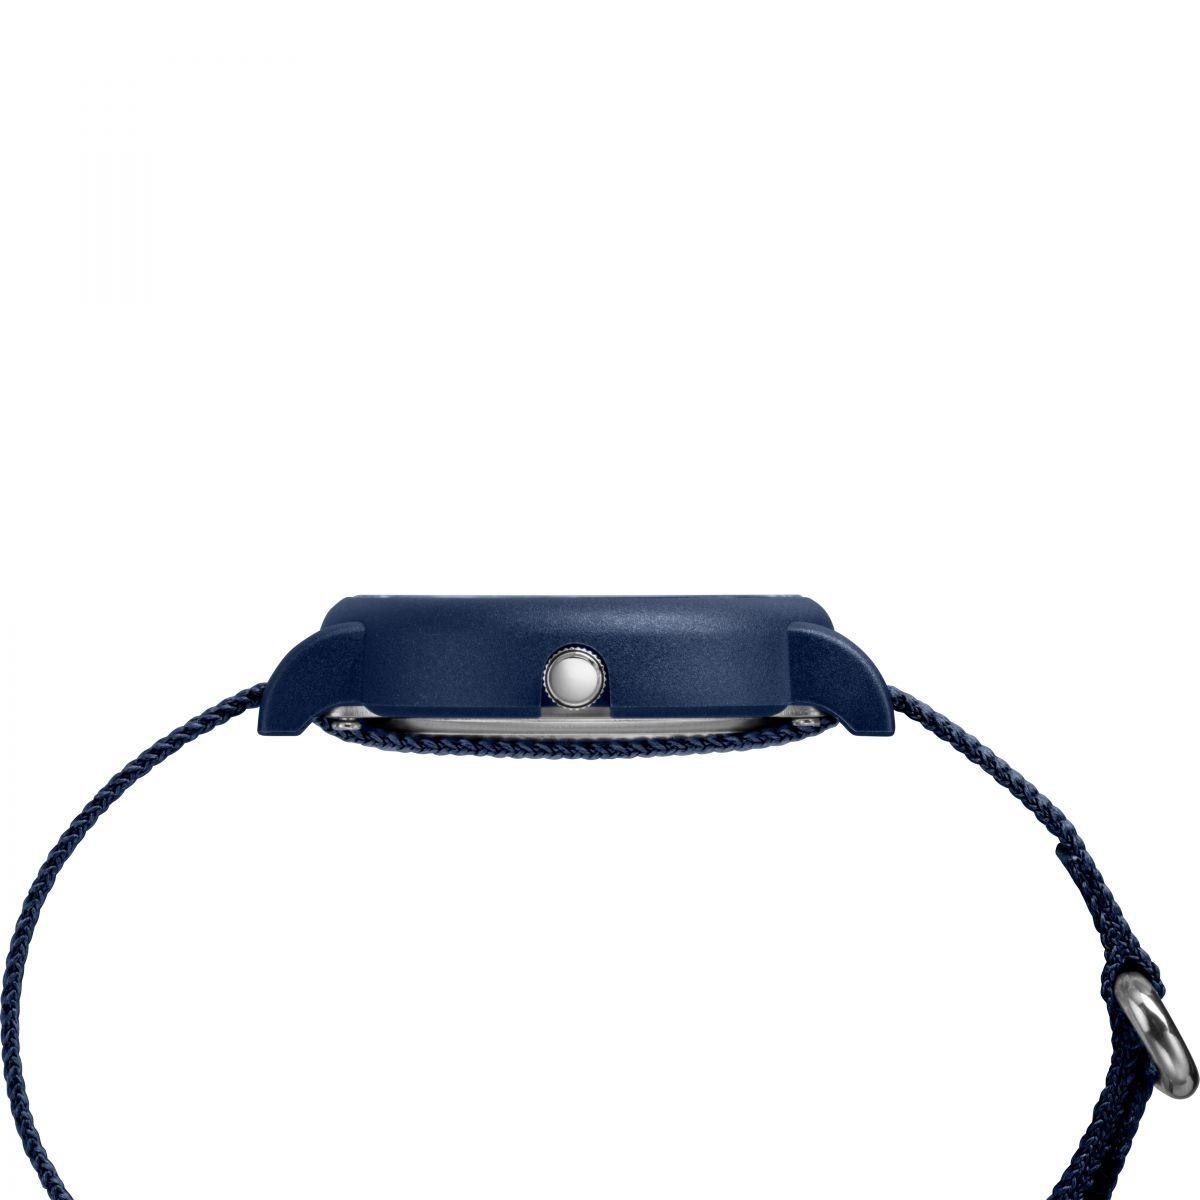 d9c57e0cc498 Reloj Timex Para Unisex Modelo  Twg018400 Envio Gratis -   699.00 en ...